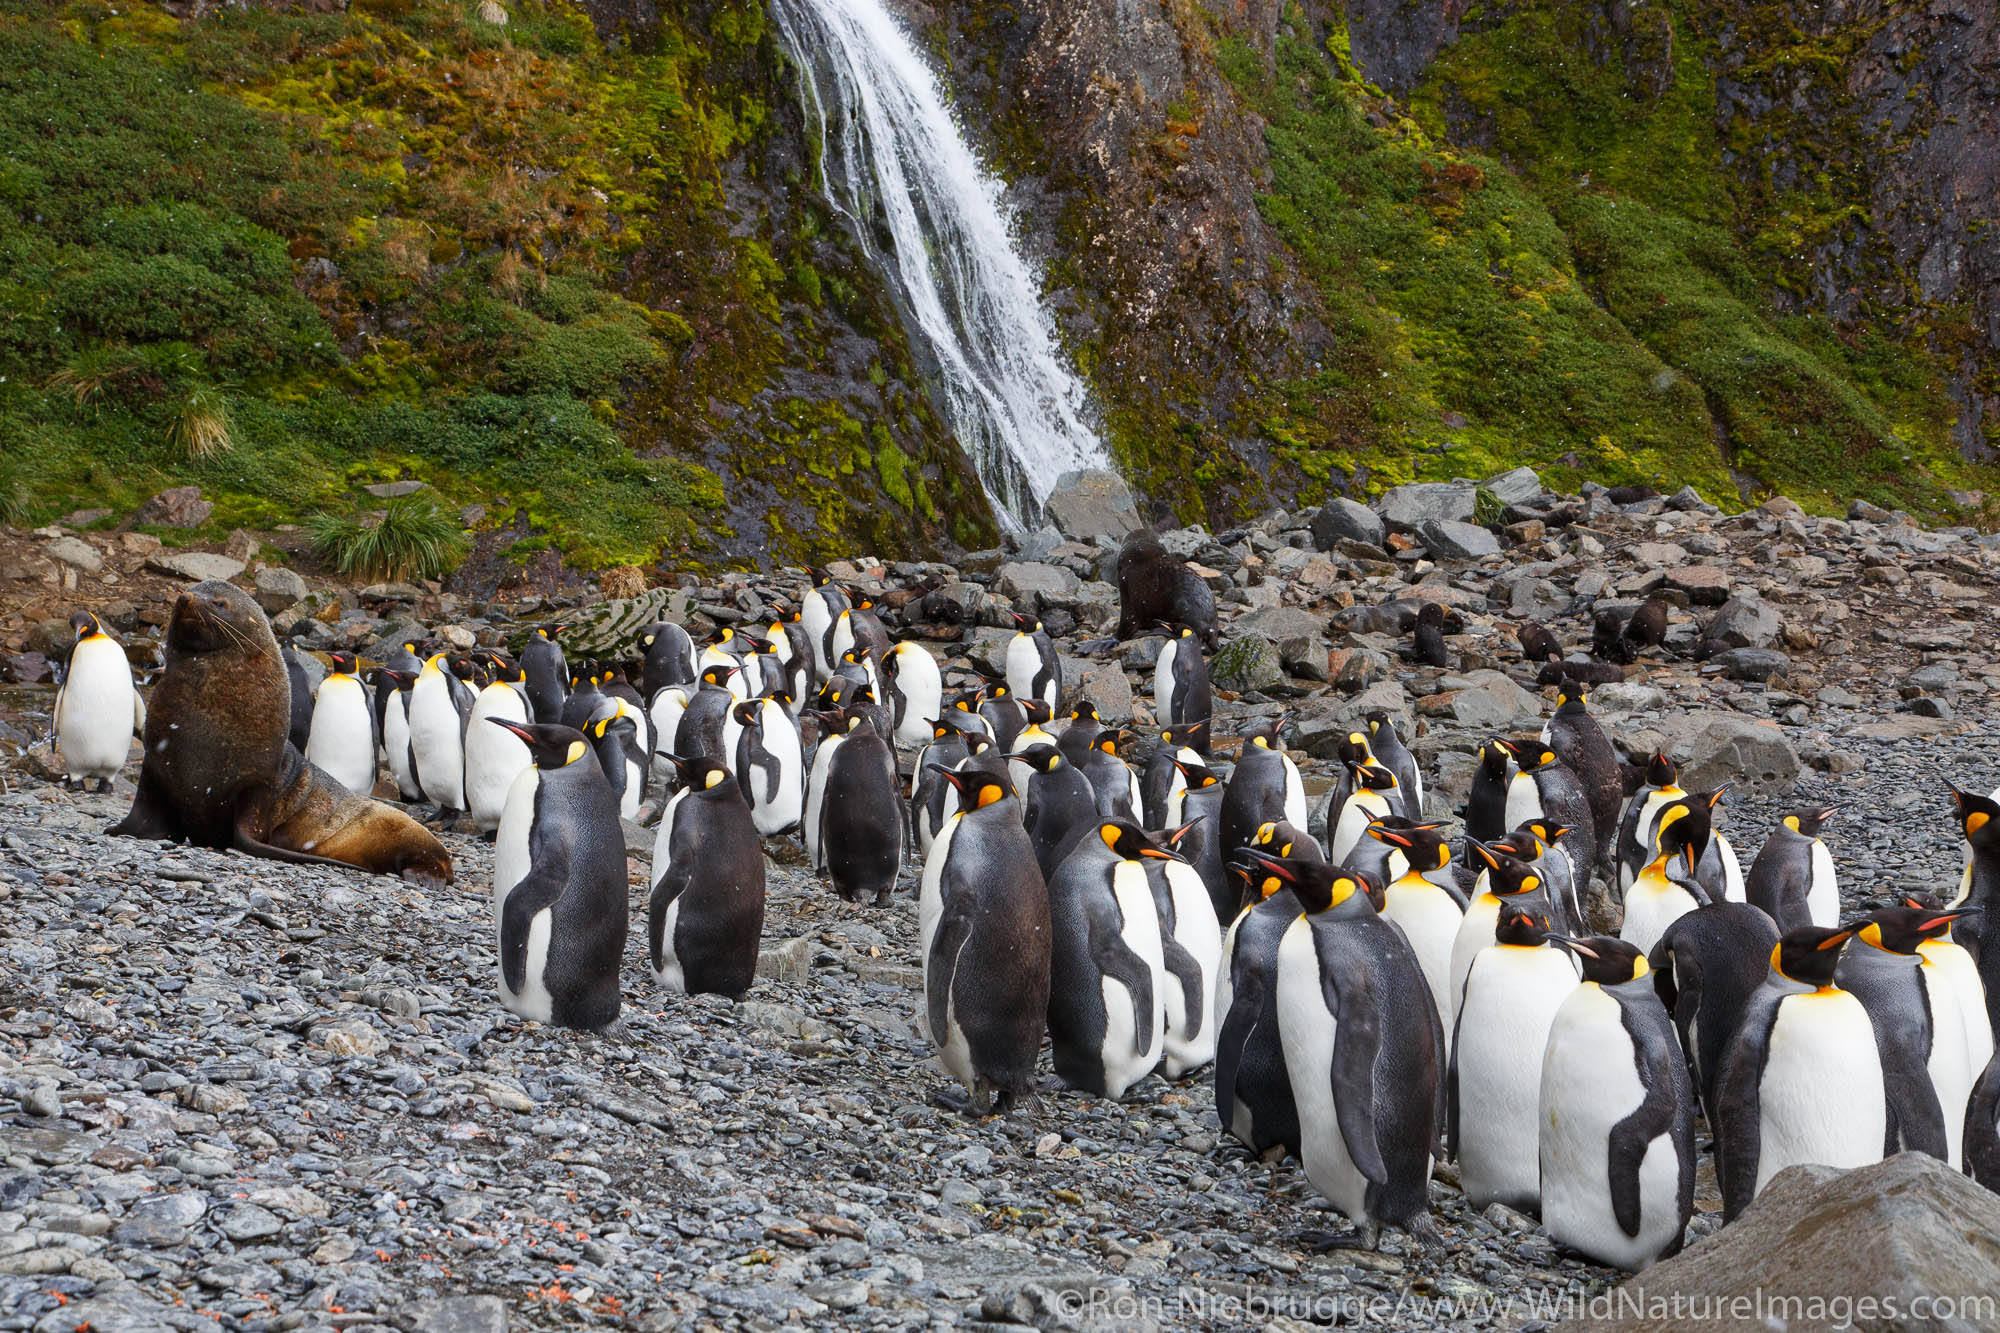 An Antarctic fur seal (Arctocephalus gazella) and macaroni penguins (Eudyptes chrysolophus), Hercules Bay, South Georgia, Antarctica...